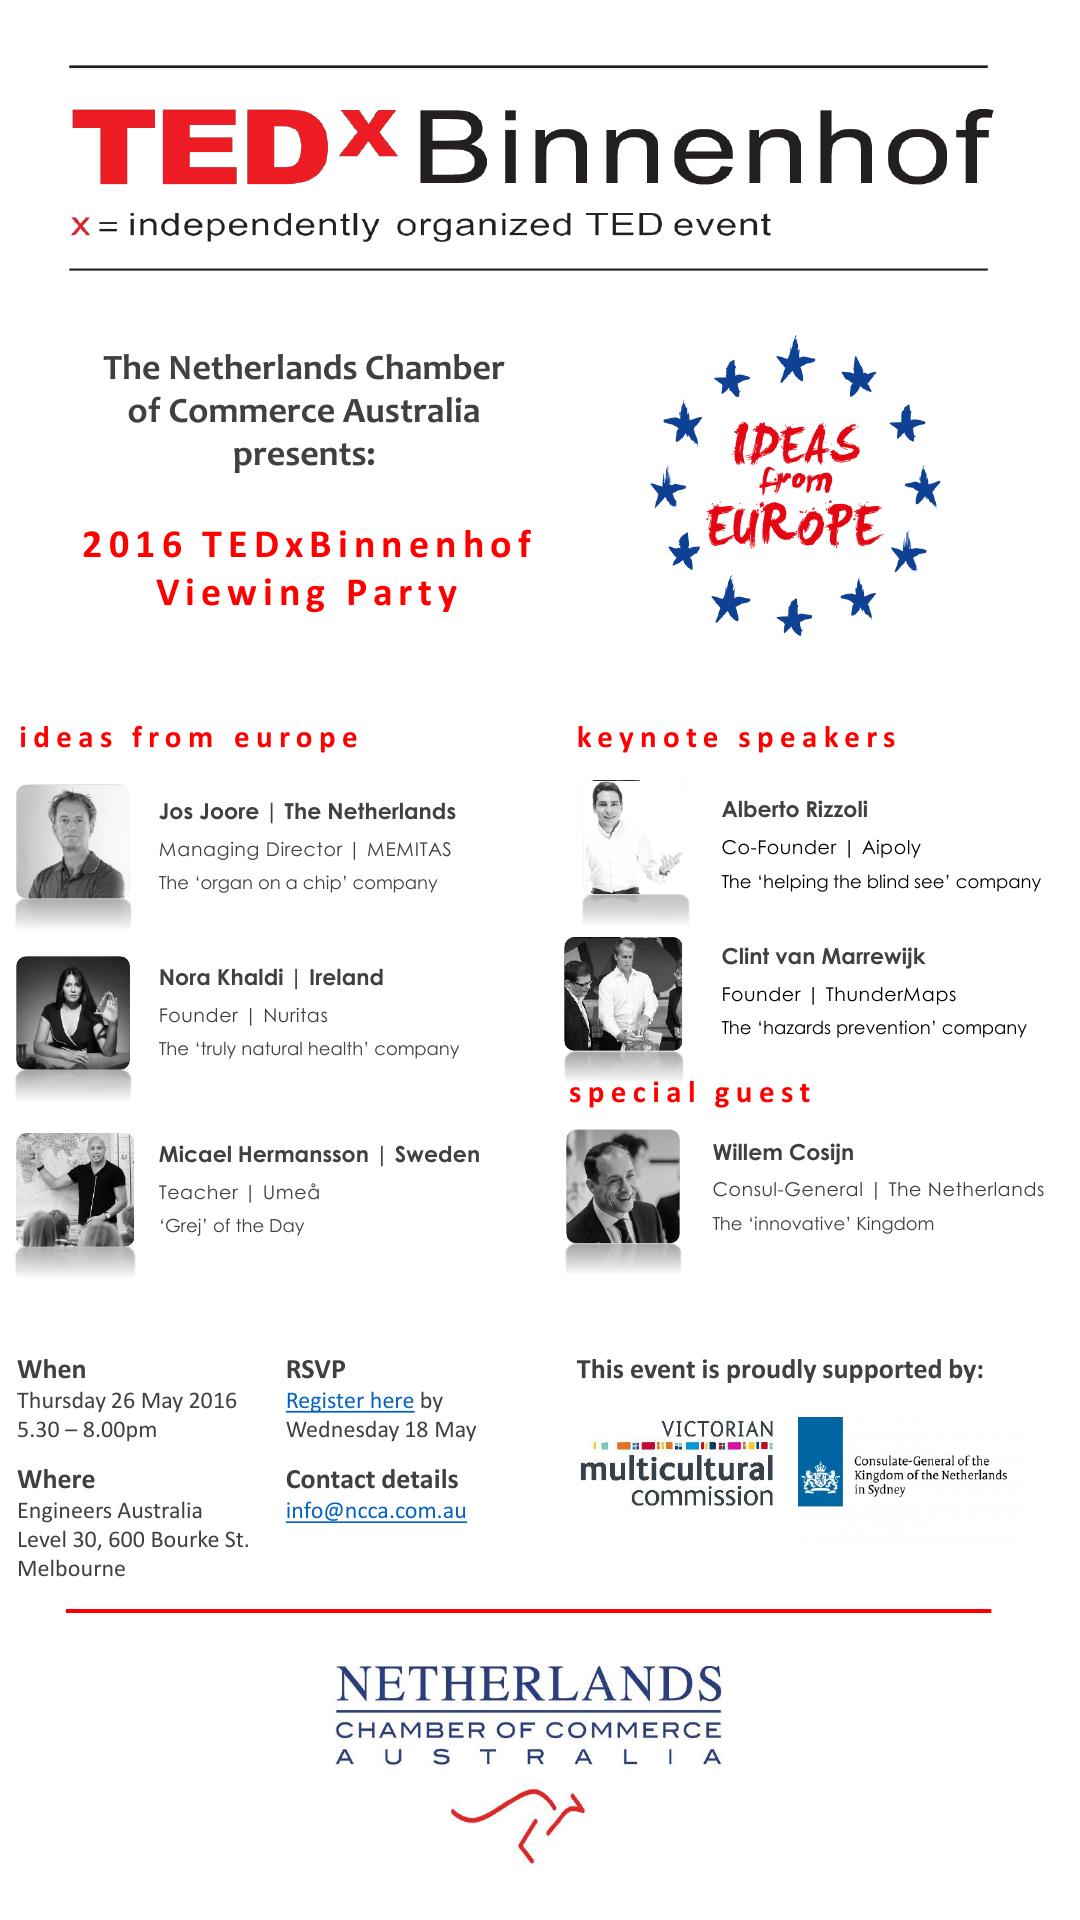 NCCA - TEDxBinnenhof 2016.png